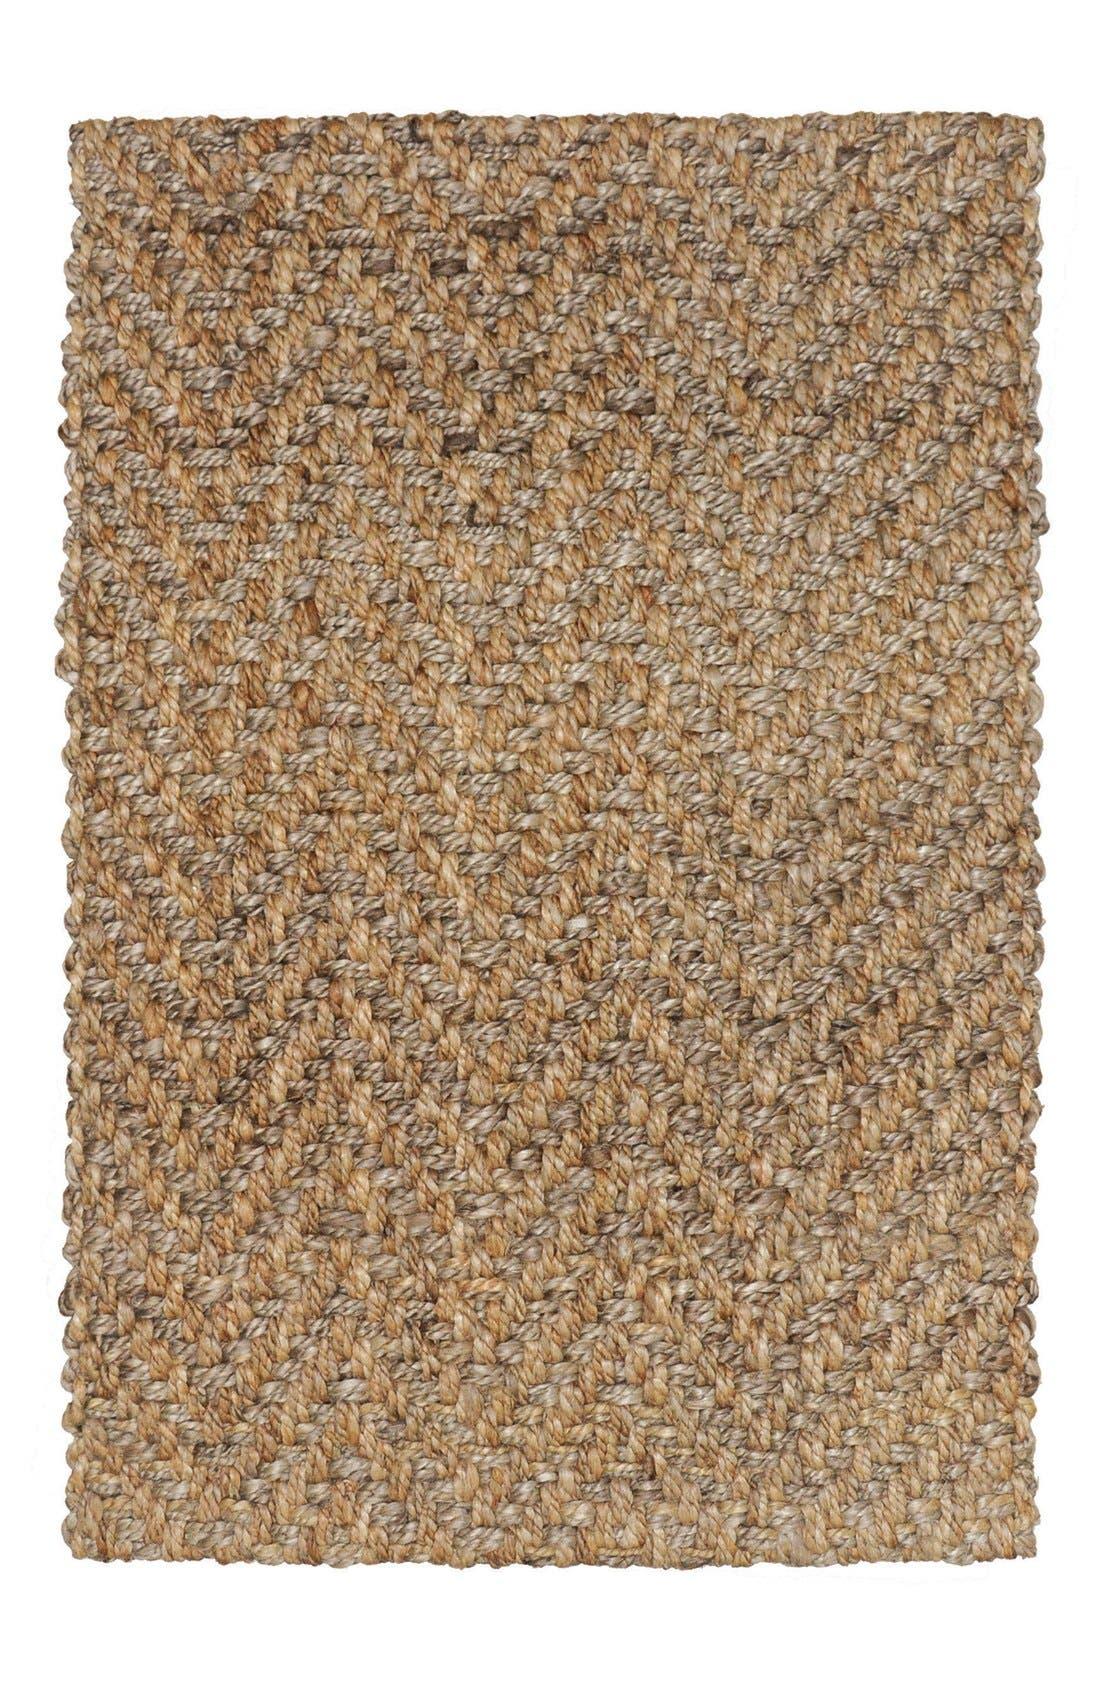 Alternate Image 1 Selected - Villa Home Collection Herringbone Handwoven Rug